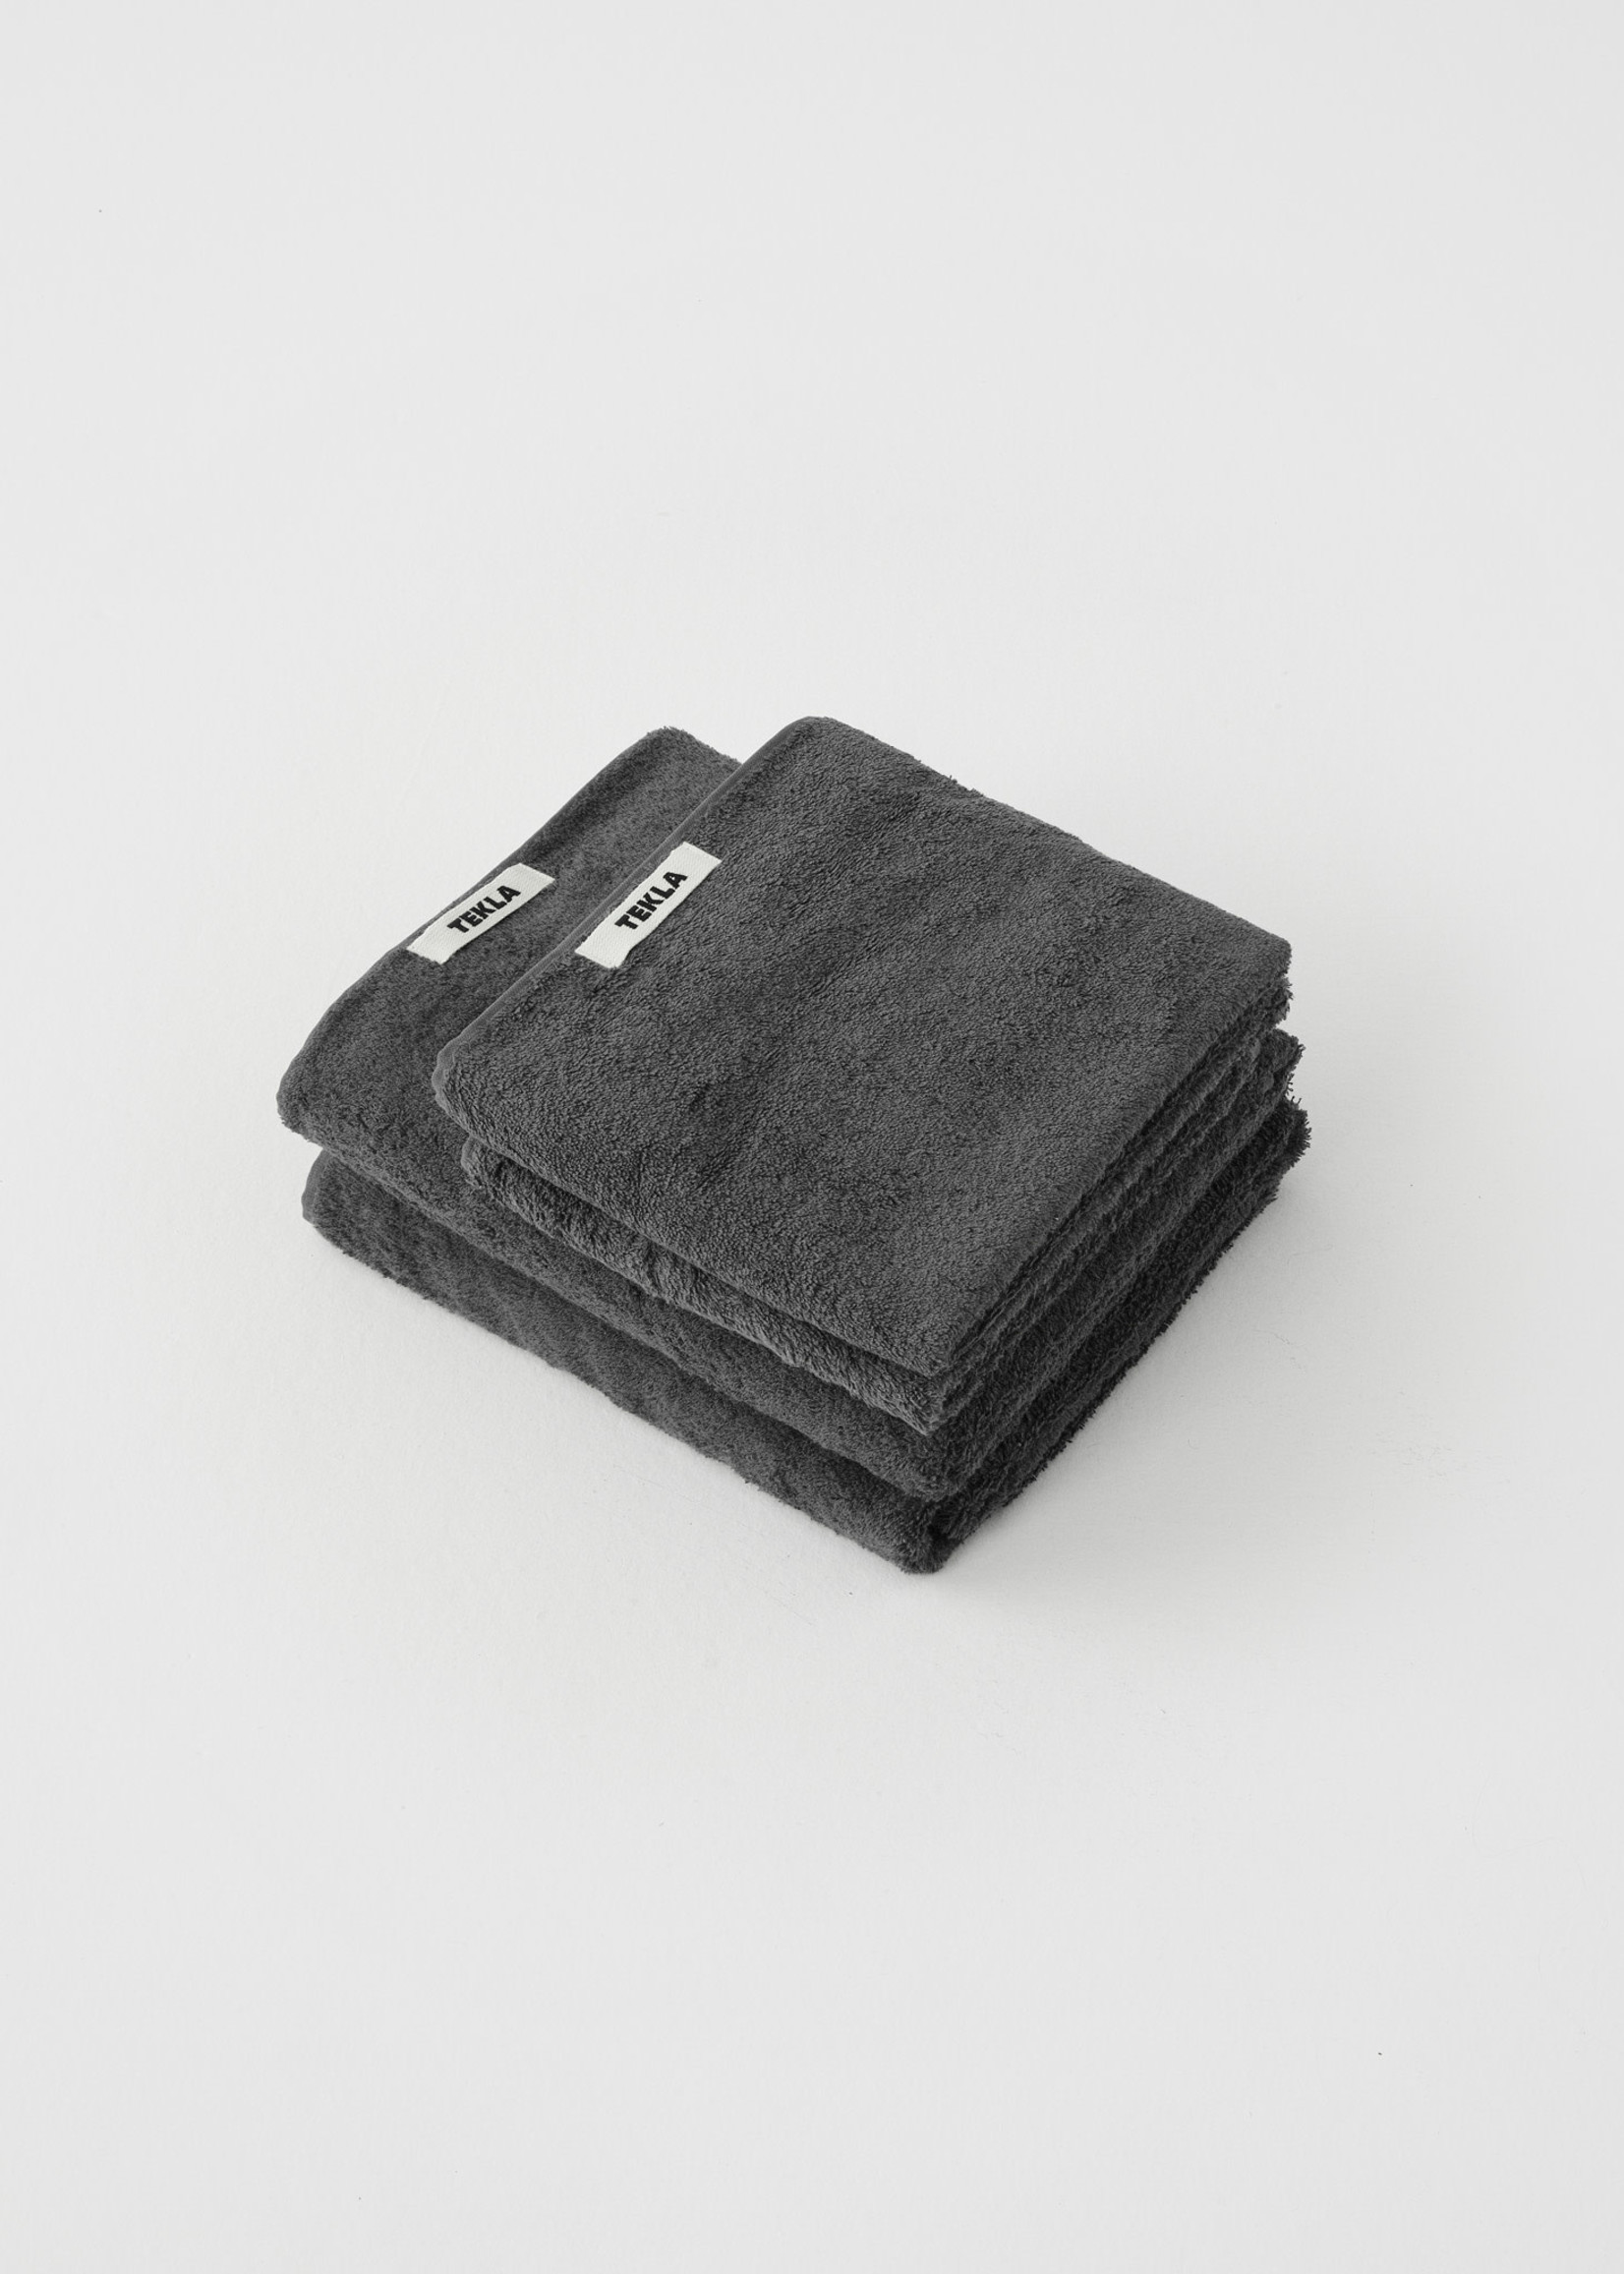 TEKLA Organic Bath Towel in Charcoal